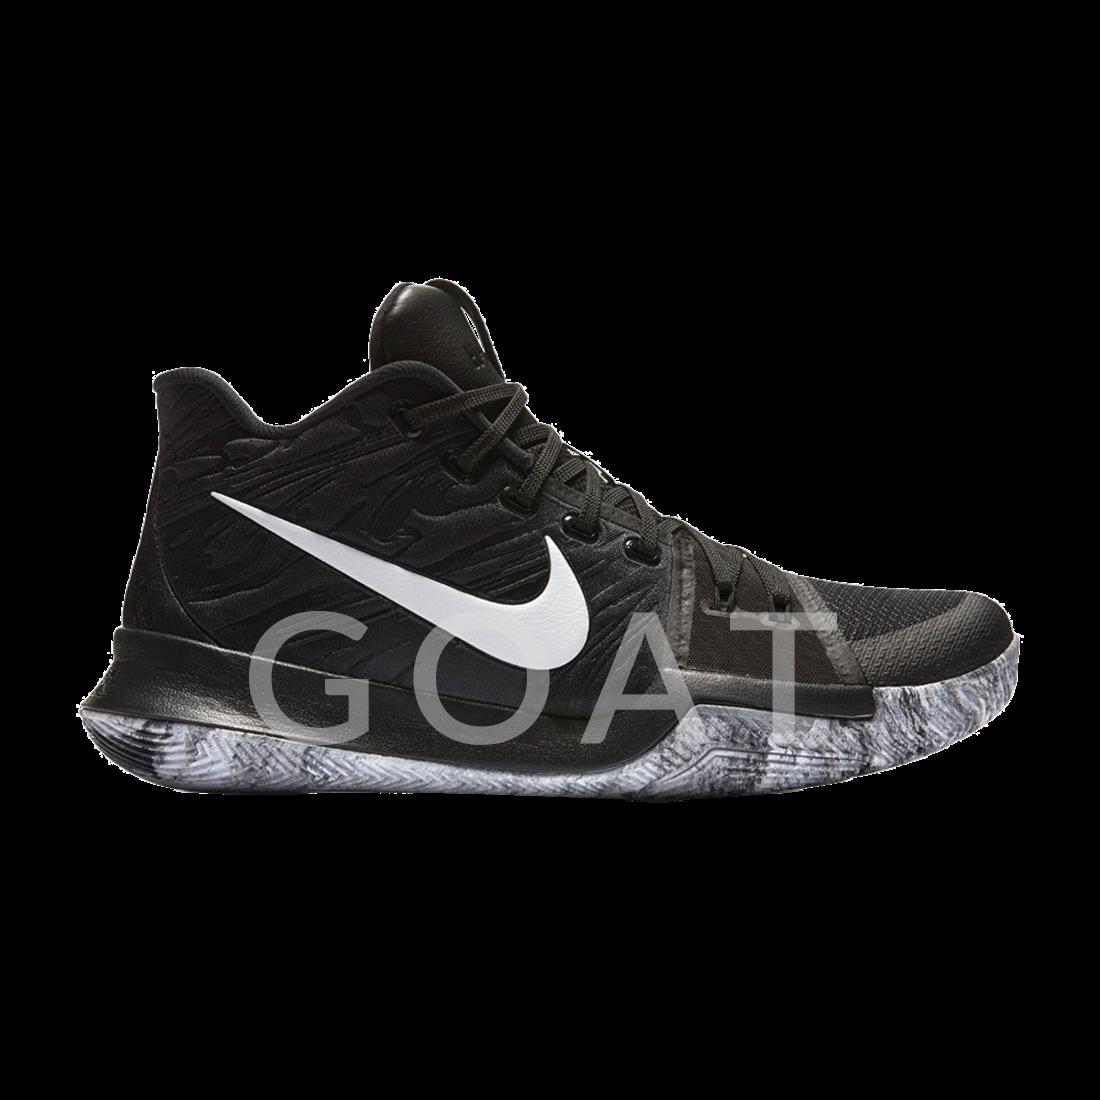 best service 56dd1 0e4db Kyrie 3  BHM  - Nike - 852415 001 - Black Metallic Gold-White   GOAT